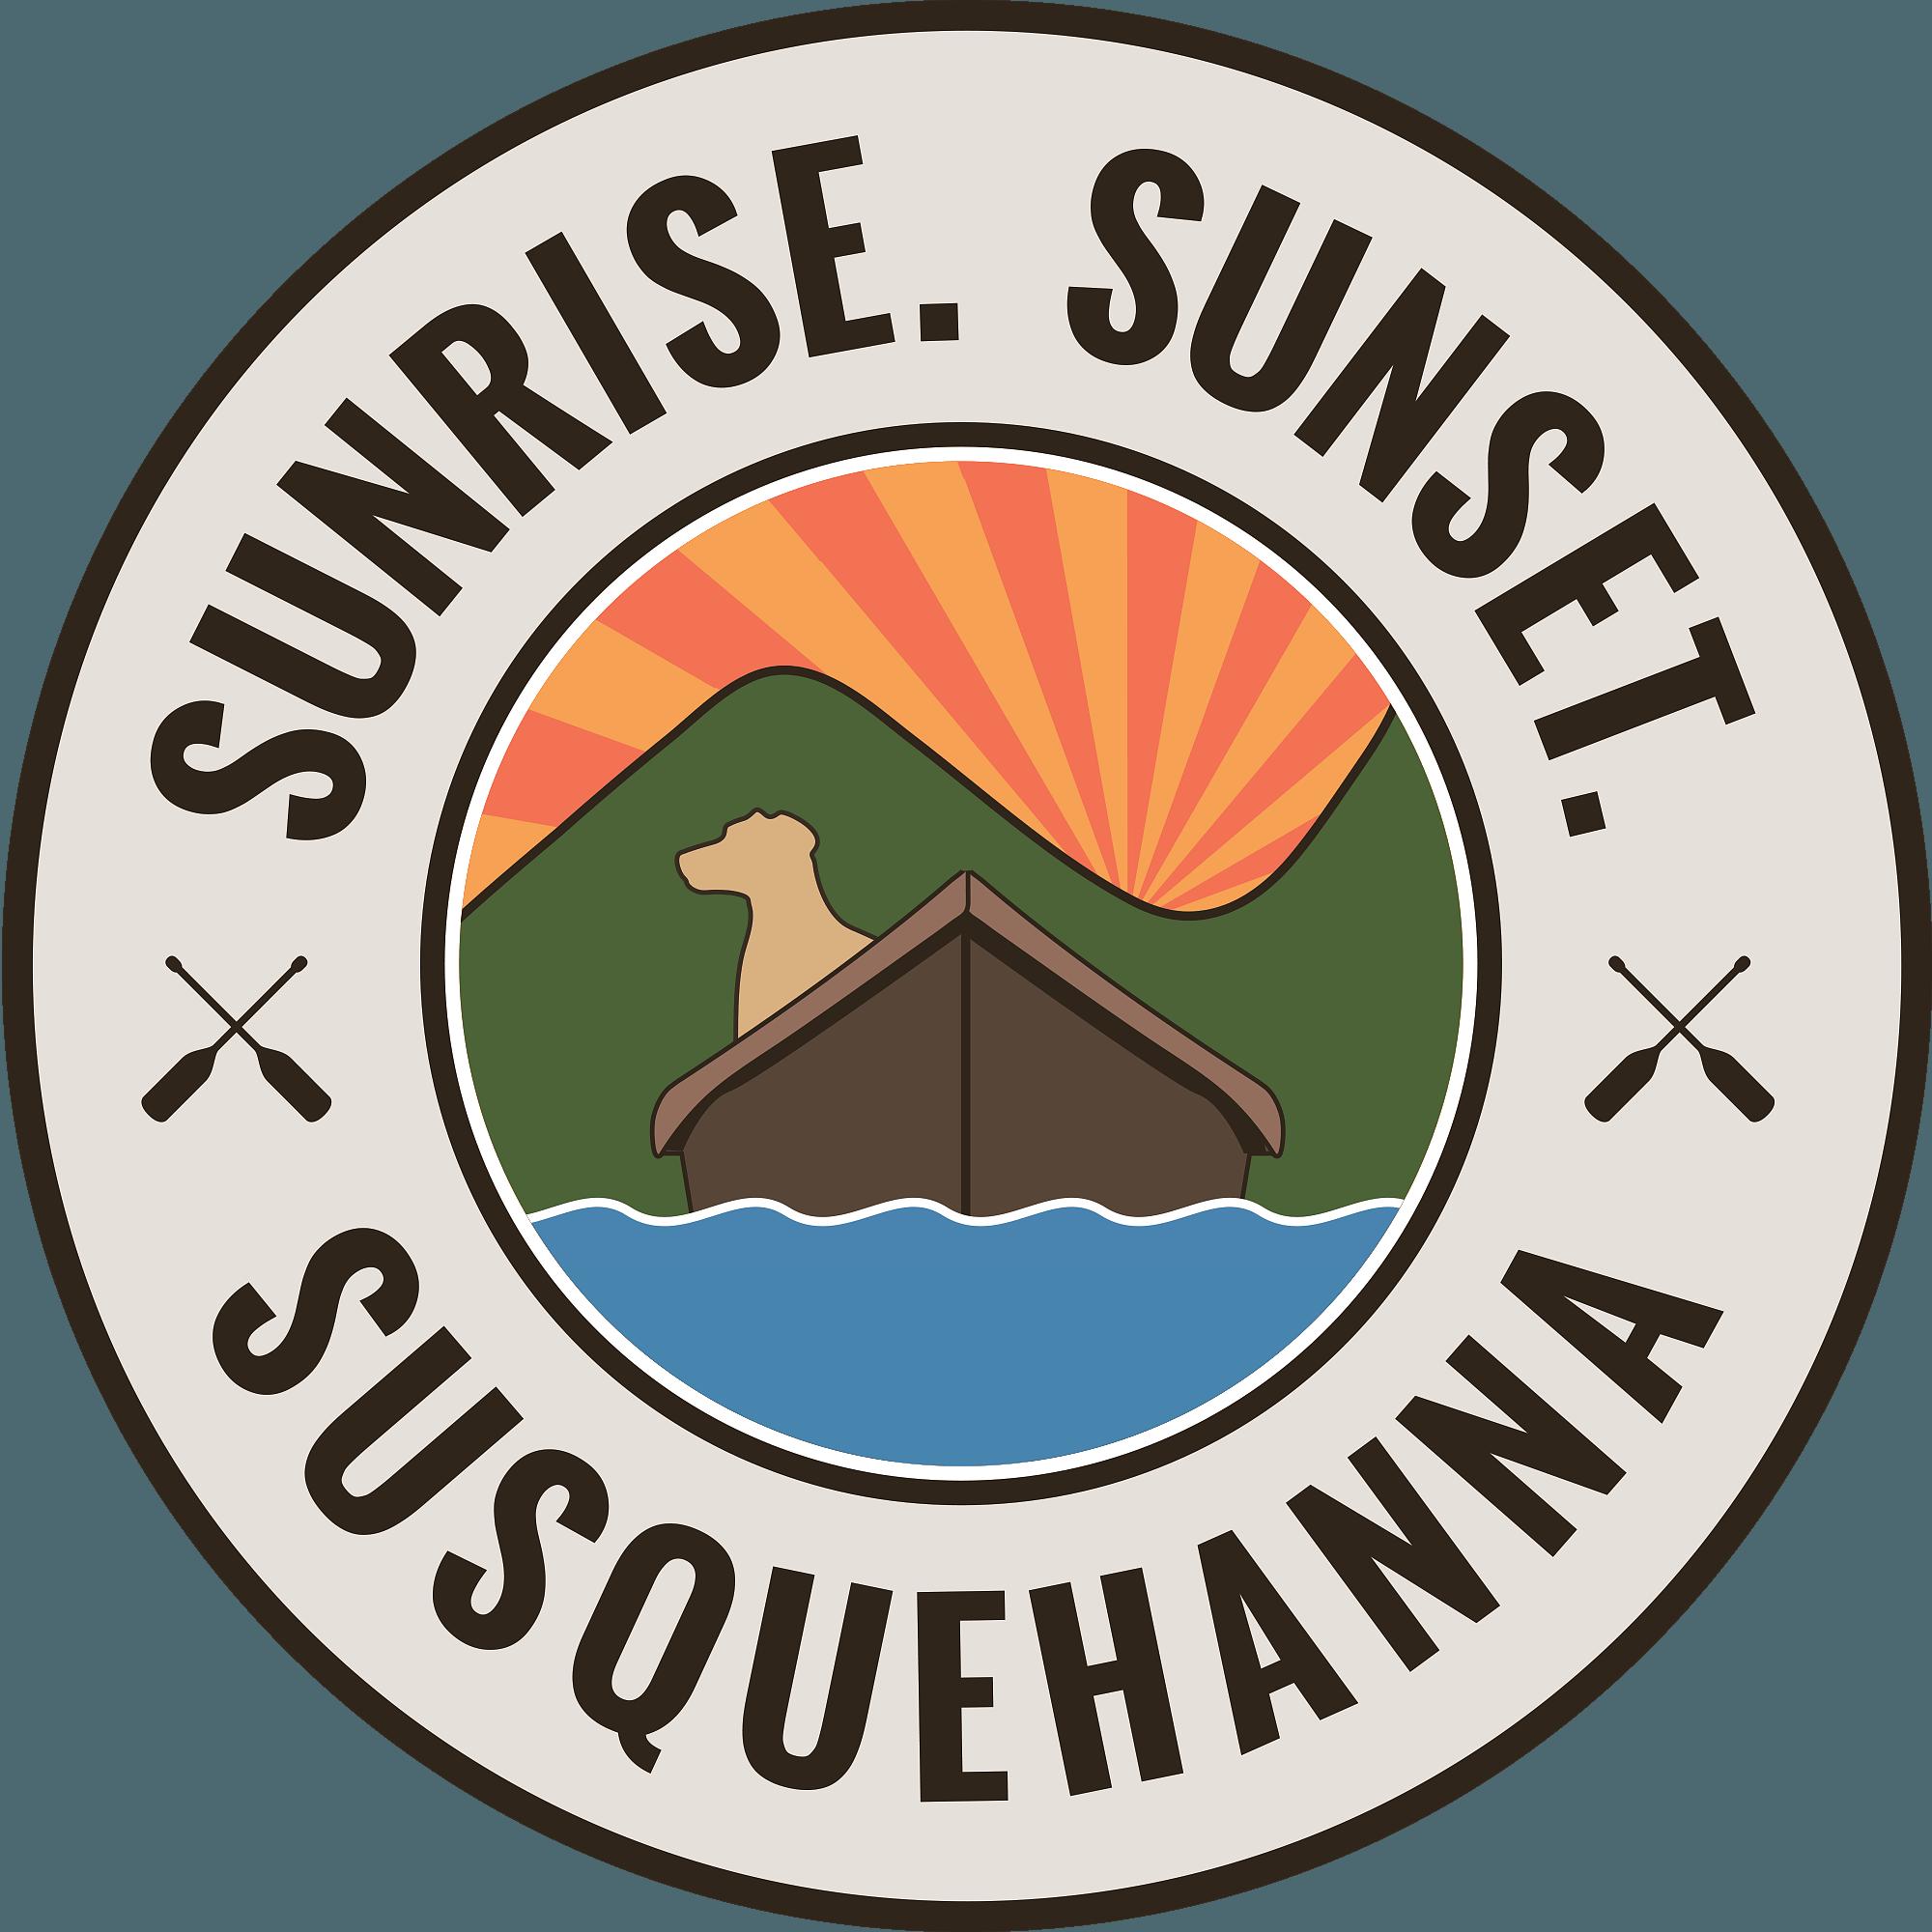 sunrise sunset susquehanna